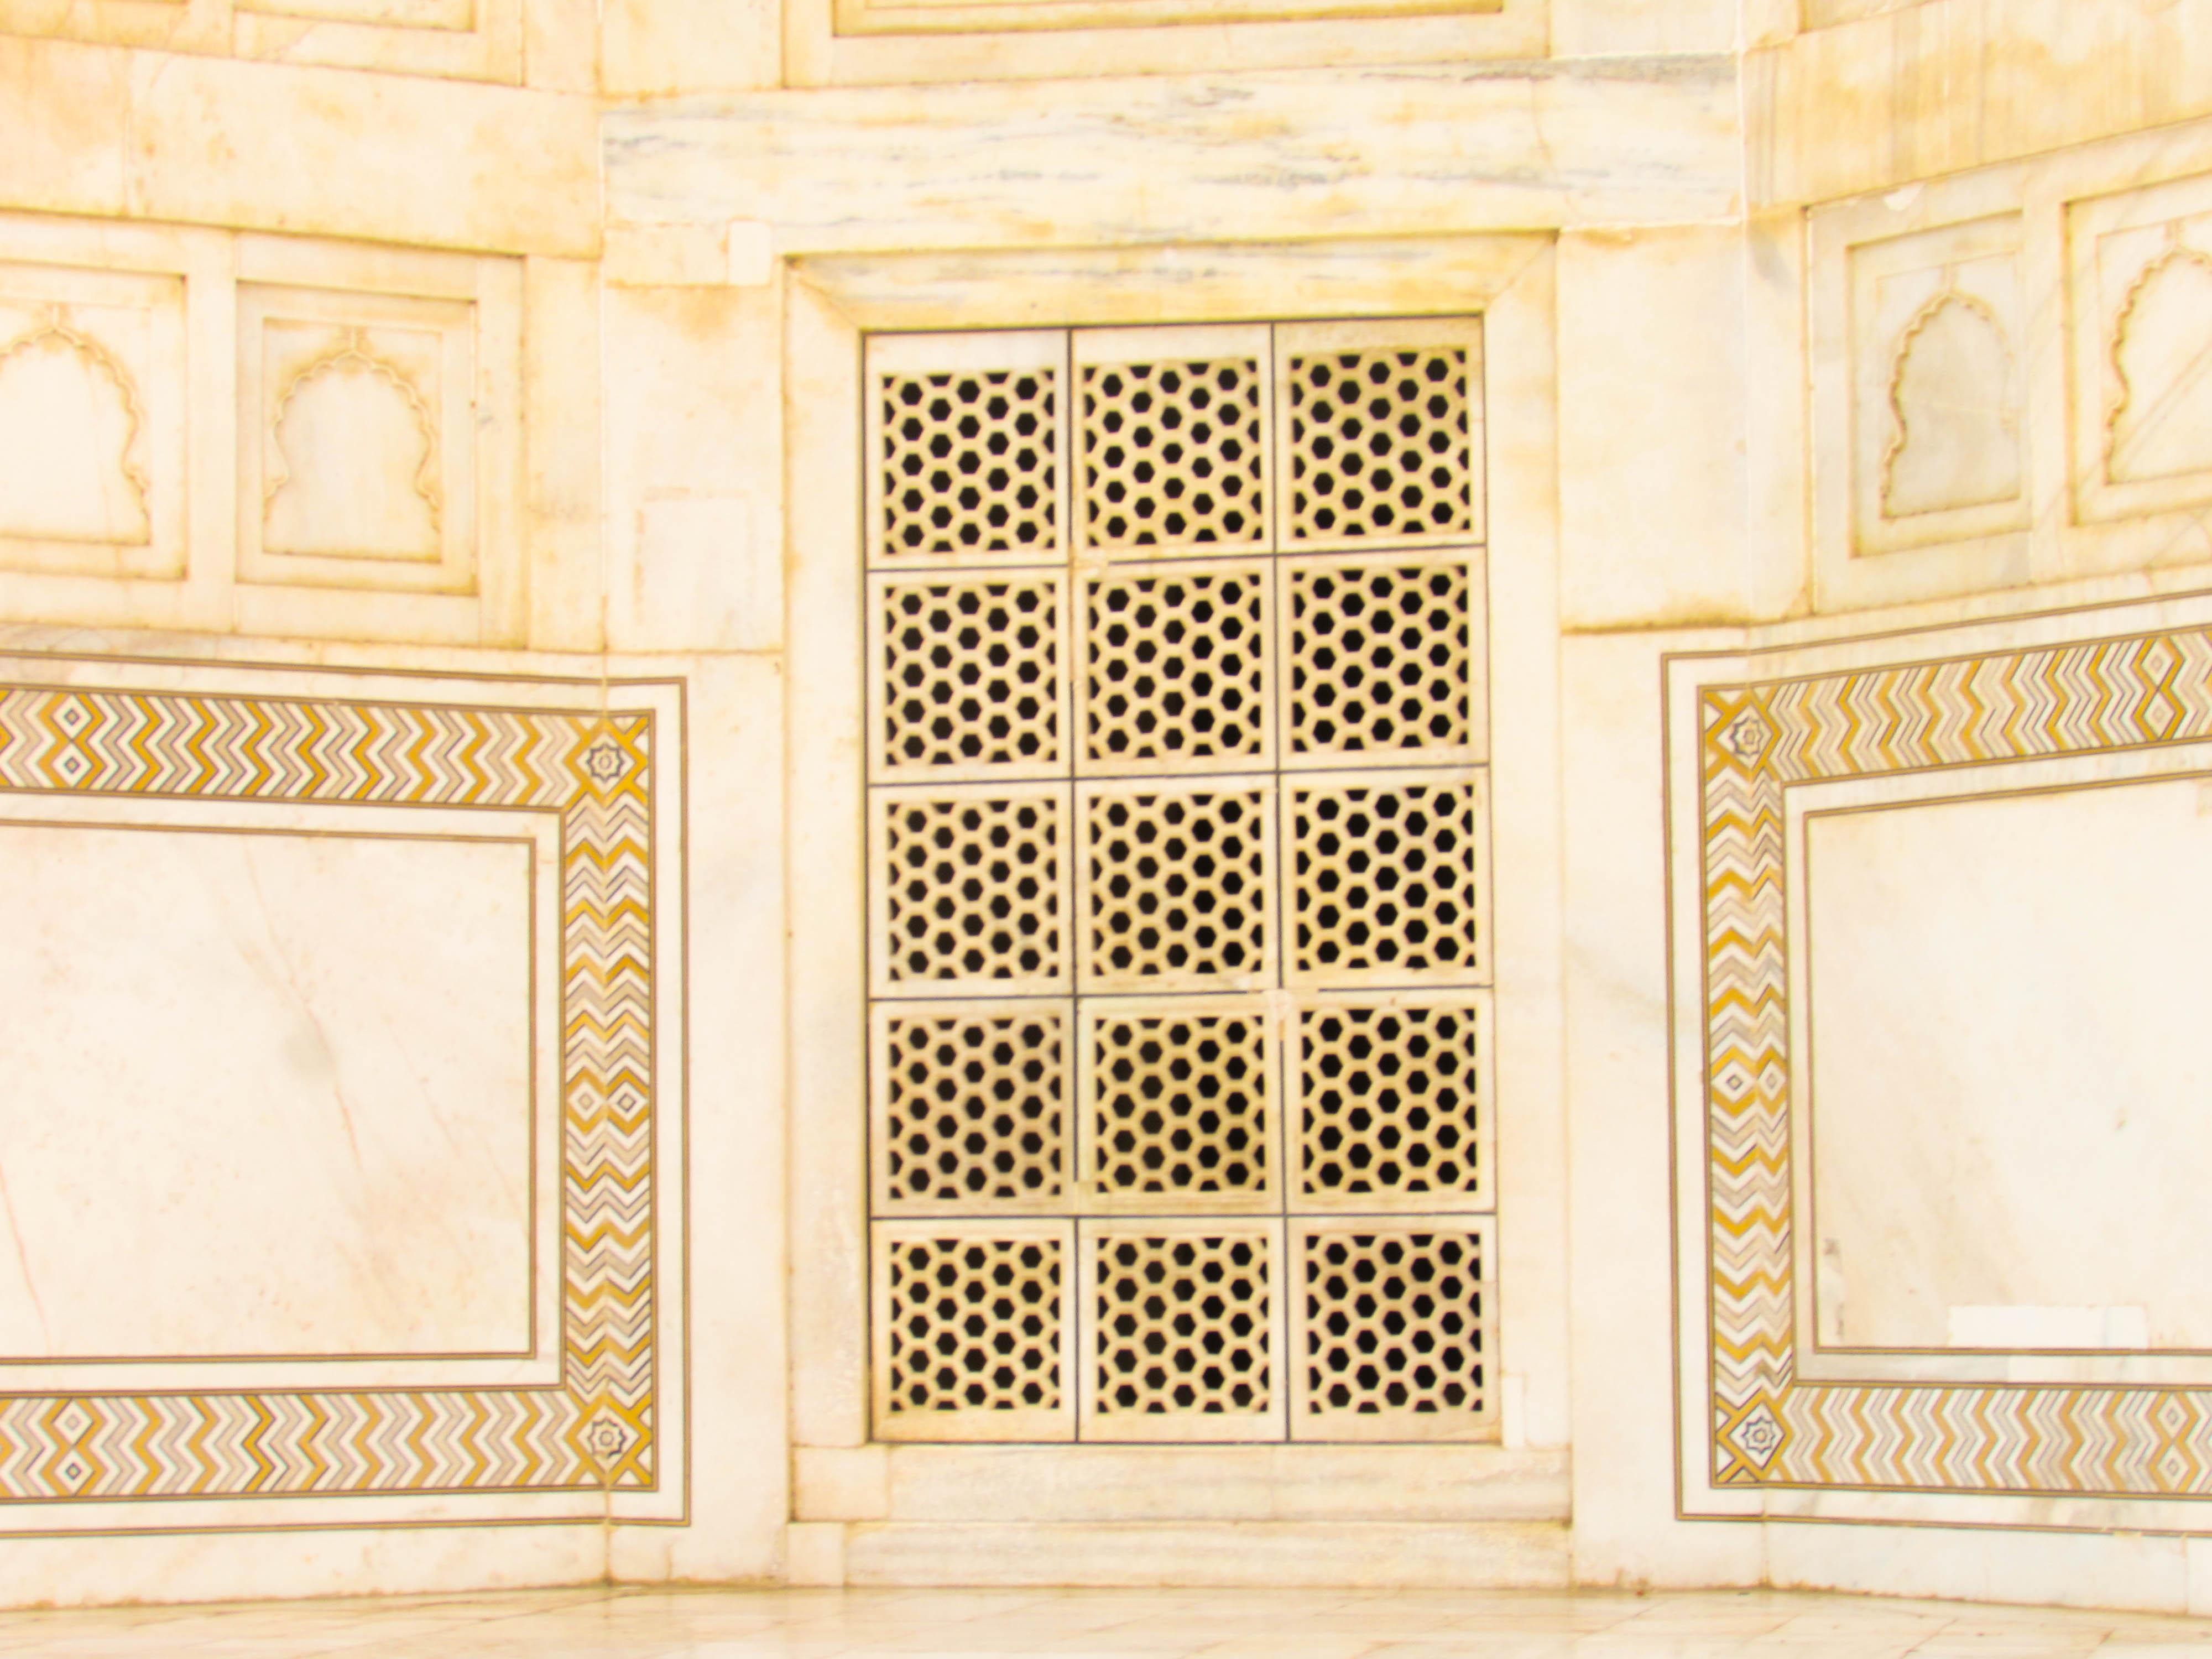 File:Taj Mahal, Agra, Uttar Pradesh te-99.jpg - Wikimedia Commons